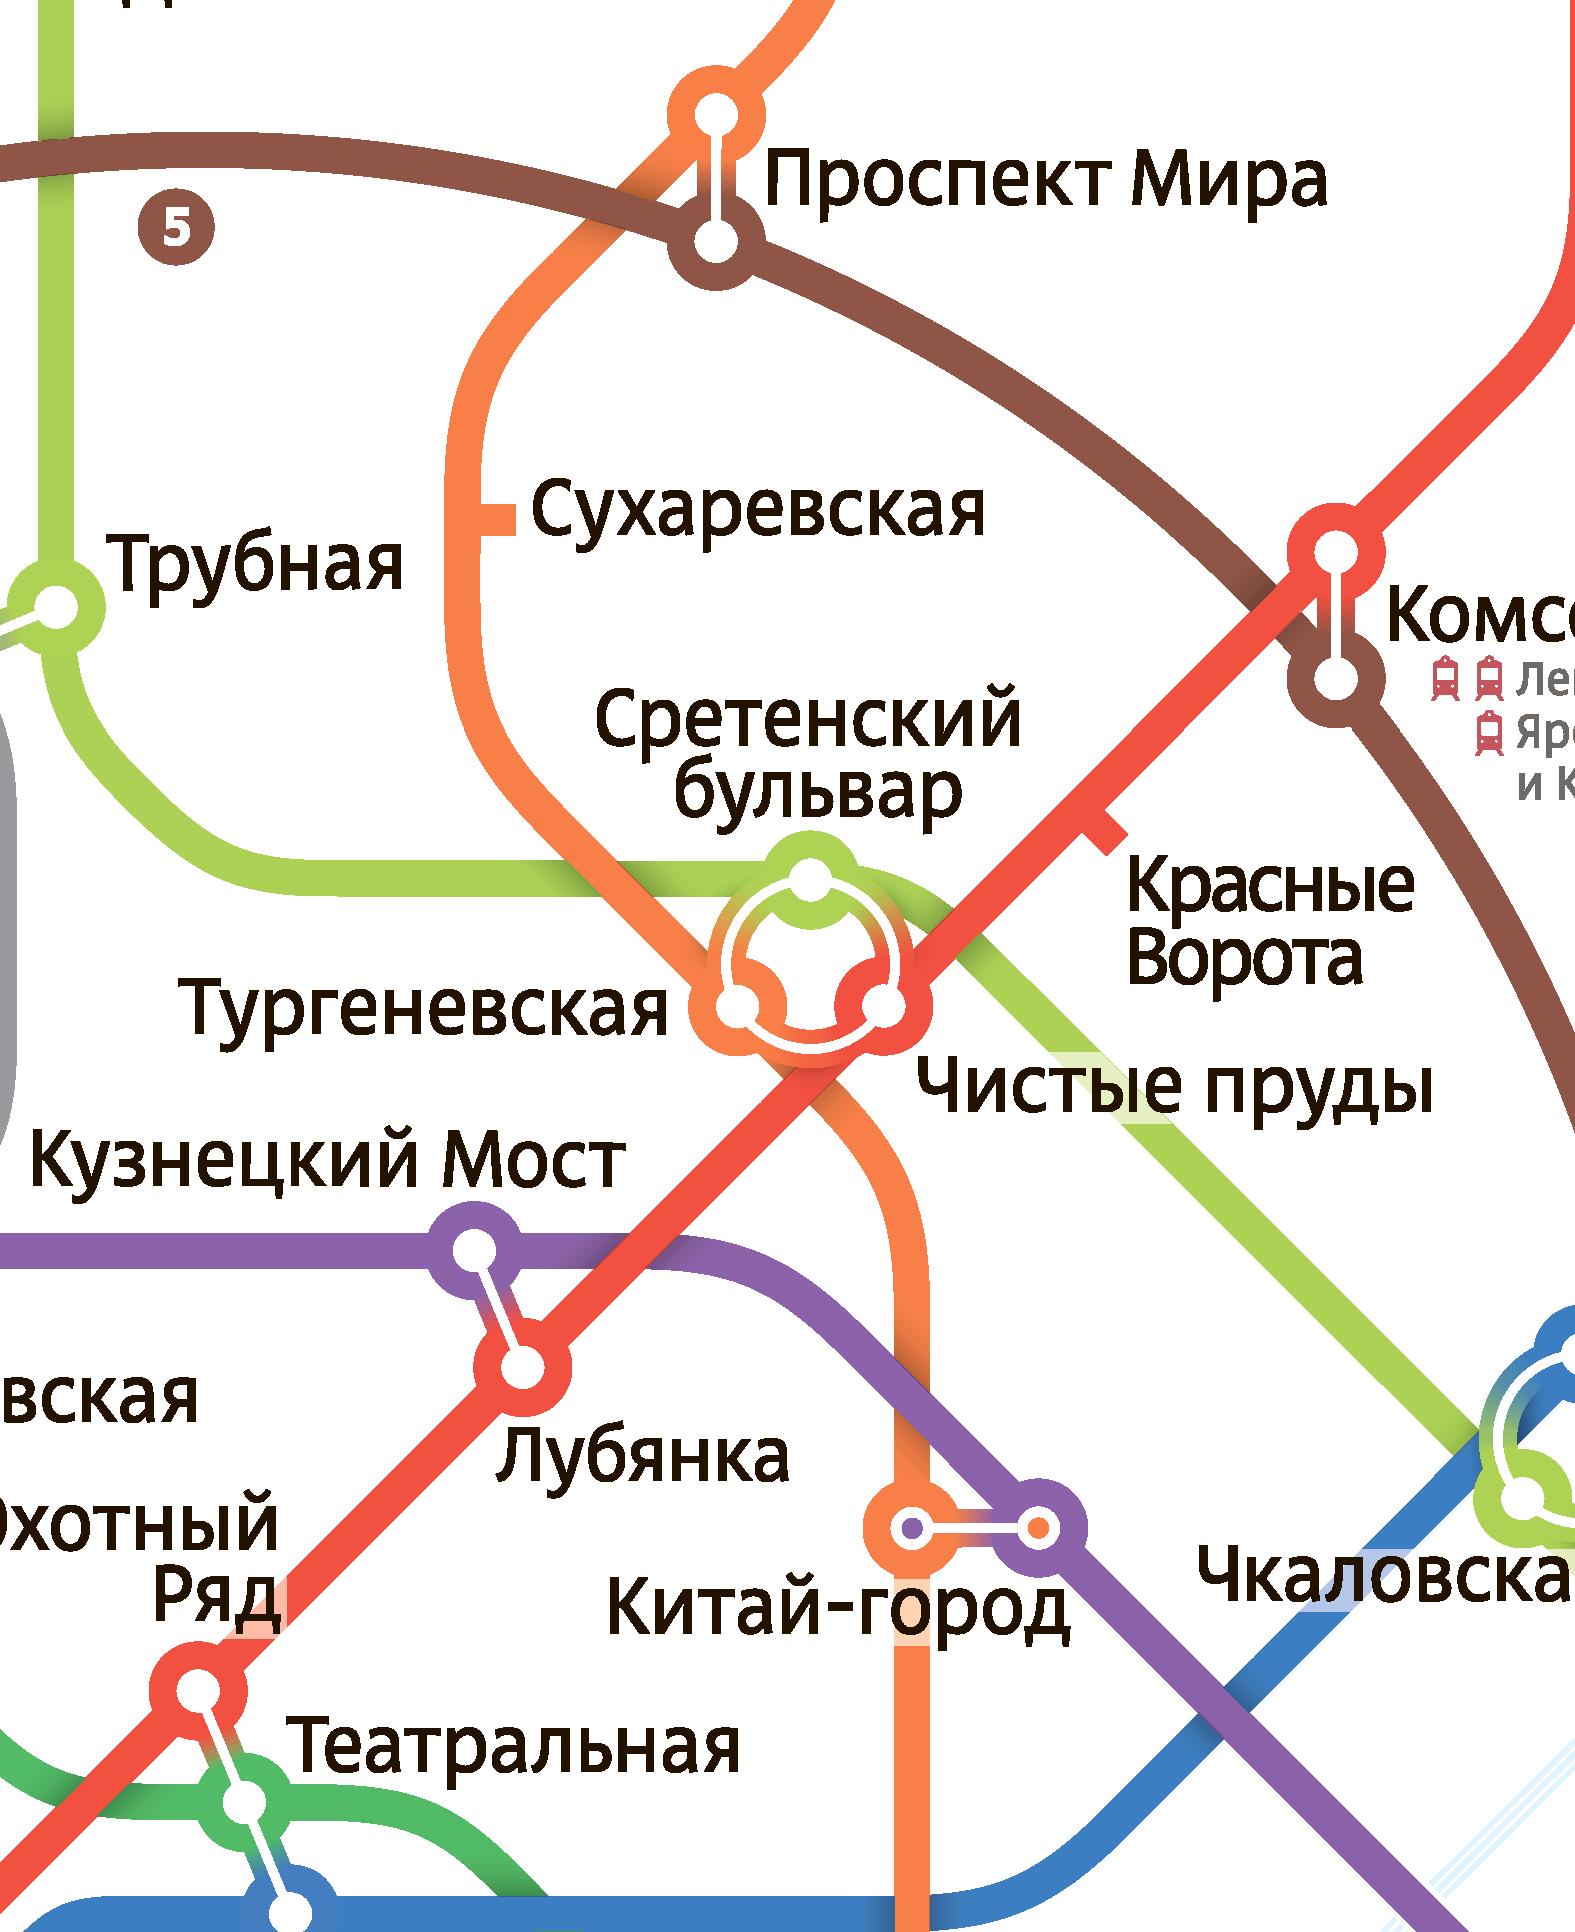 схема на карту московского метро до 2020 года